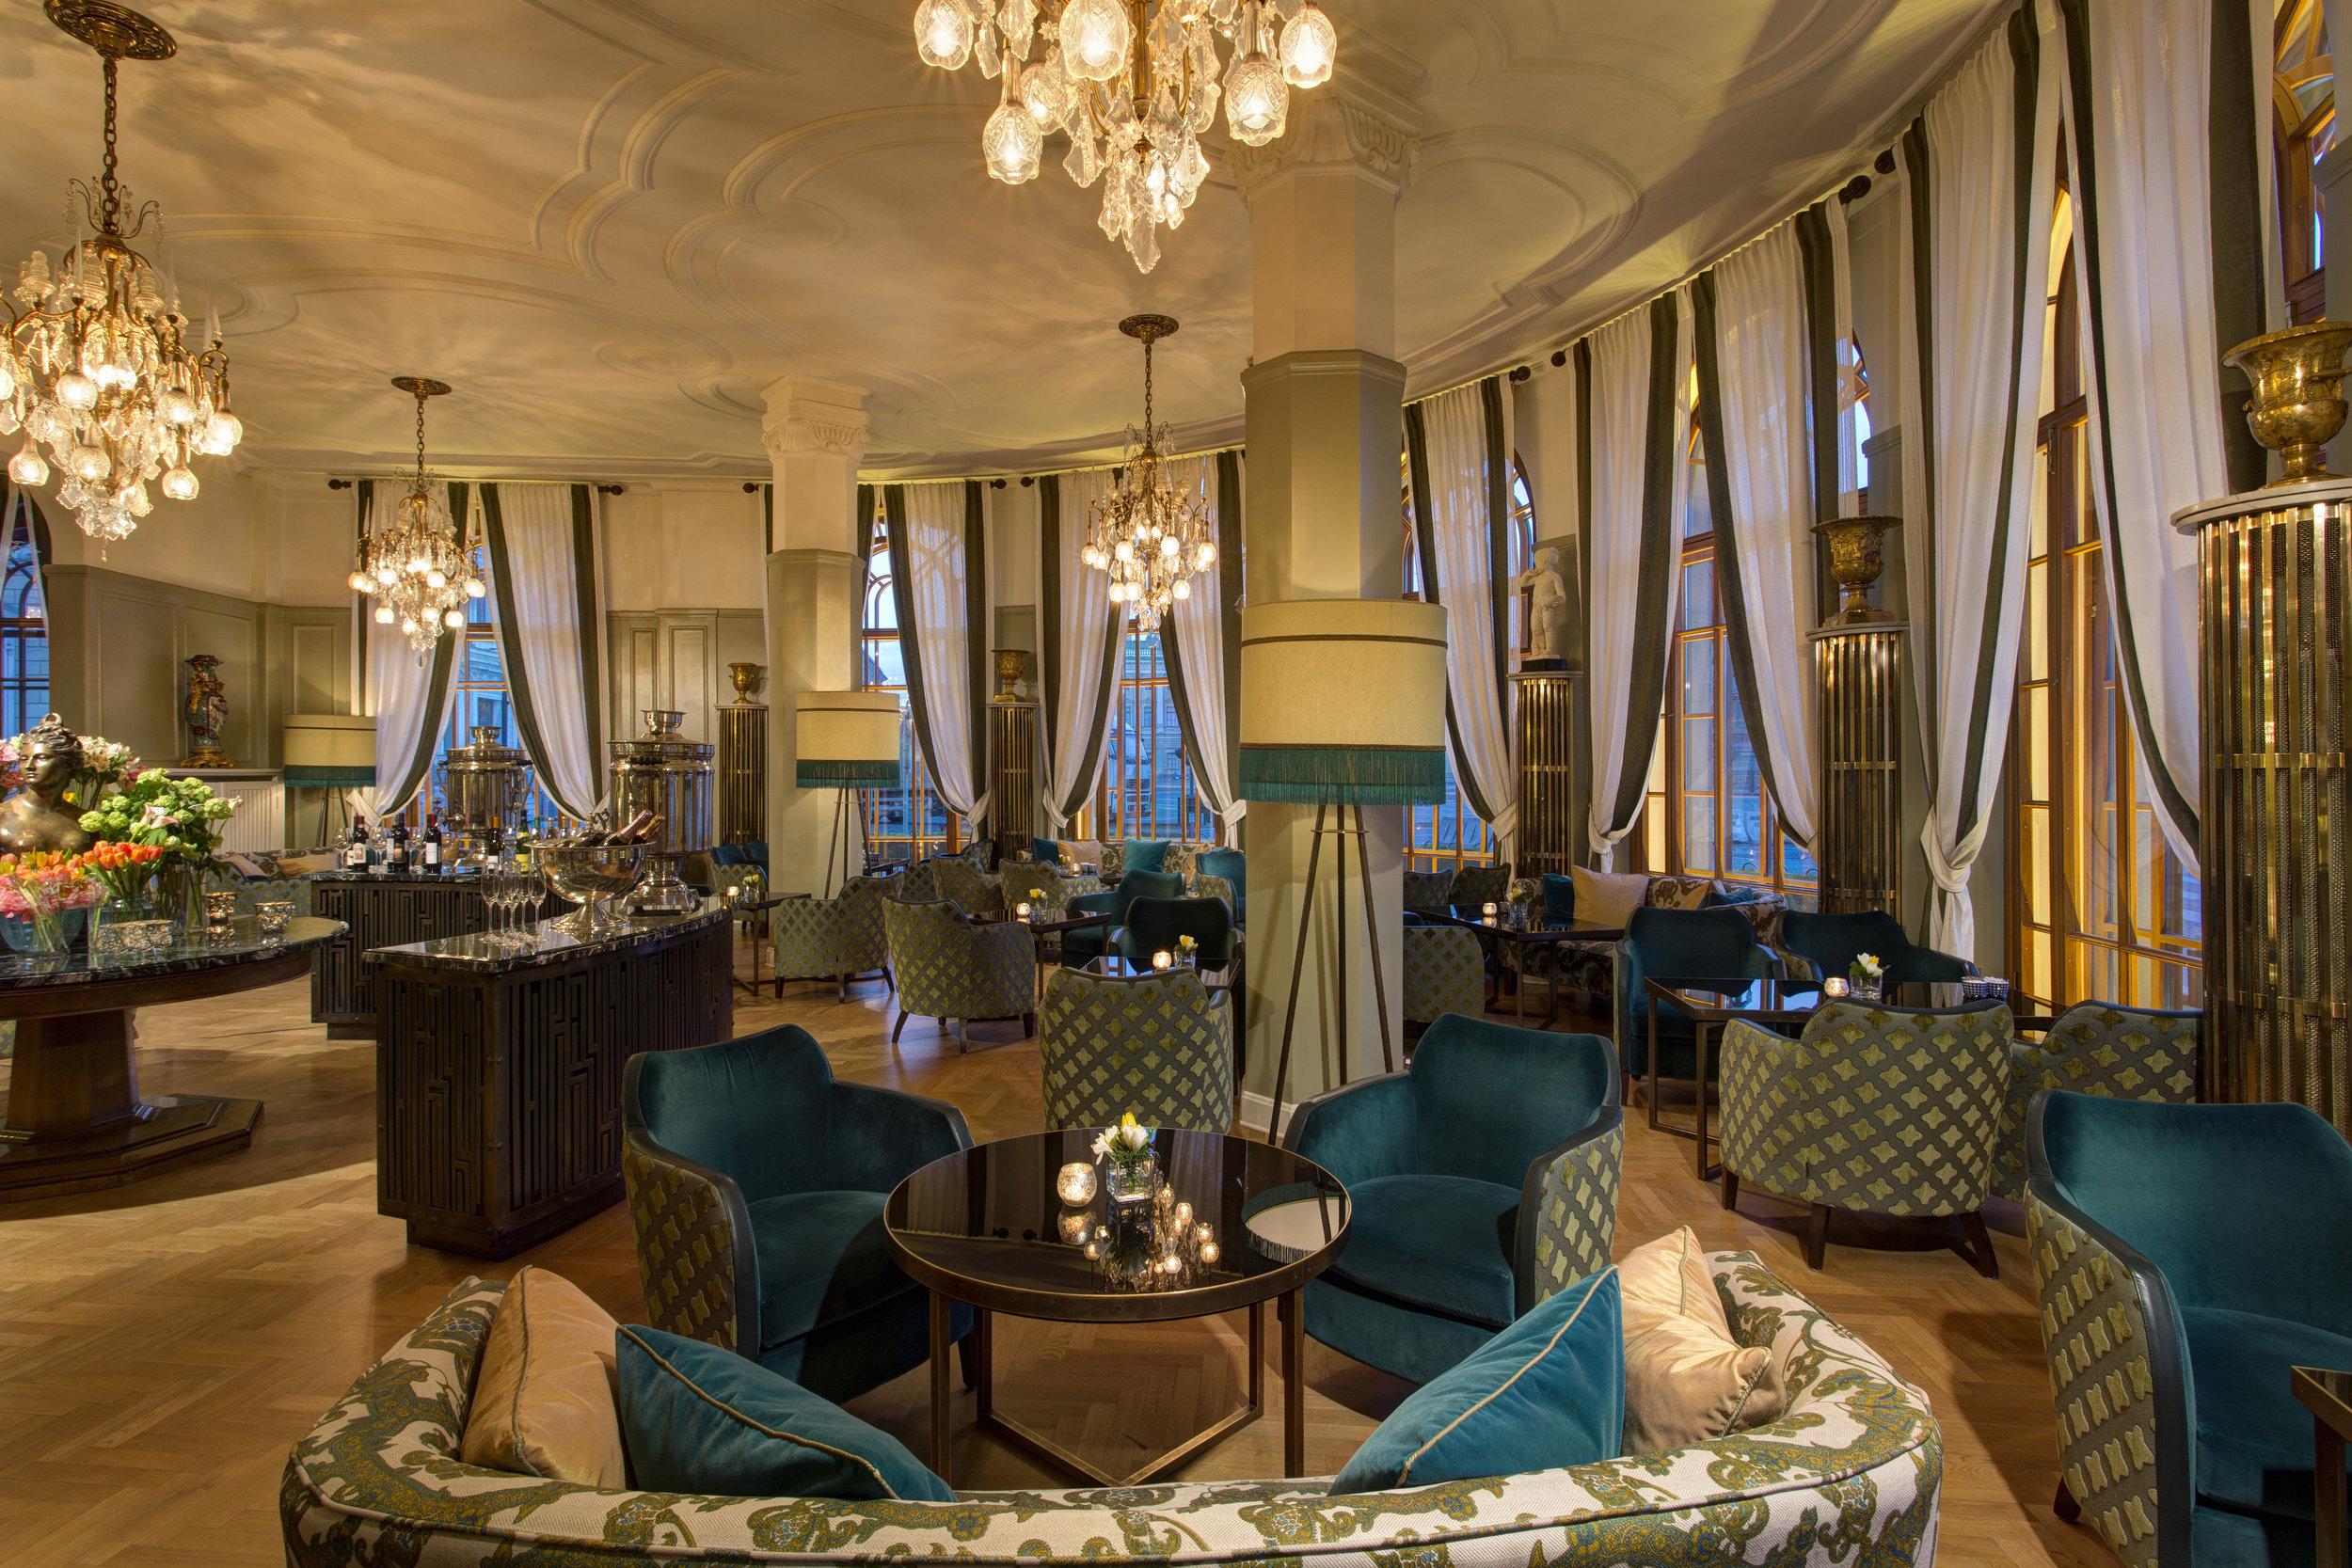 3 RFH Hotel Astoria - Rotonda Lounge 7889.JPG